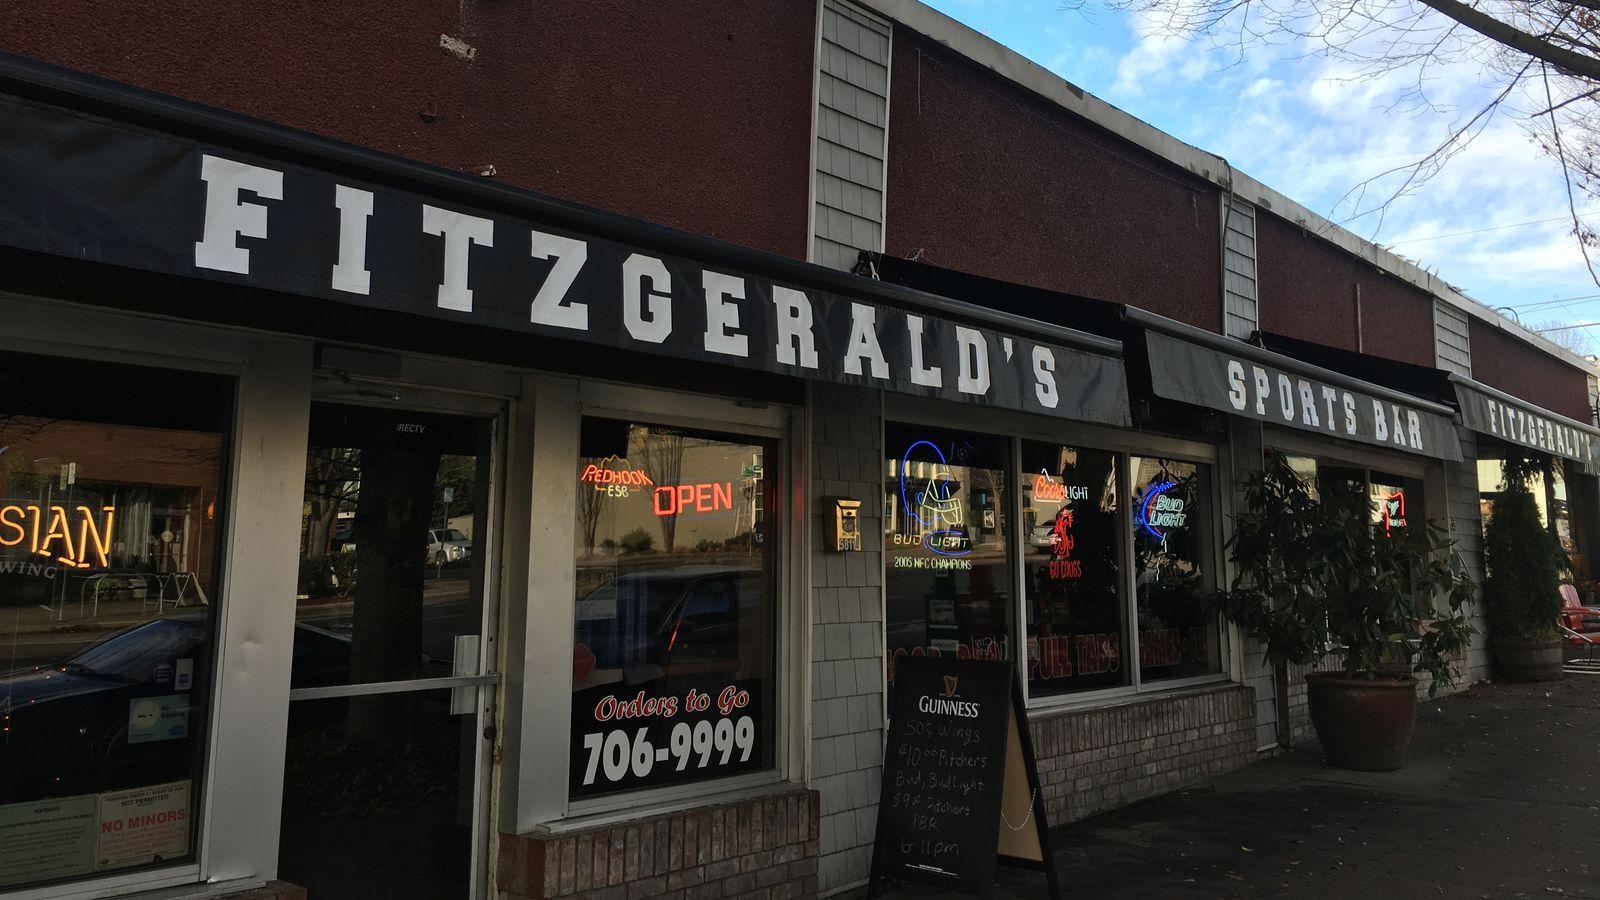 Ballard S Wingmasters Is Now Fitzgerald S Sports Bar